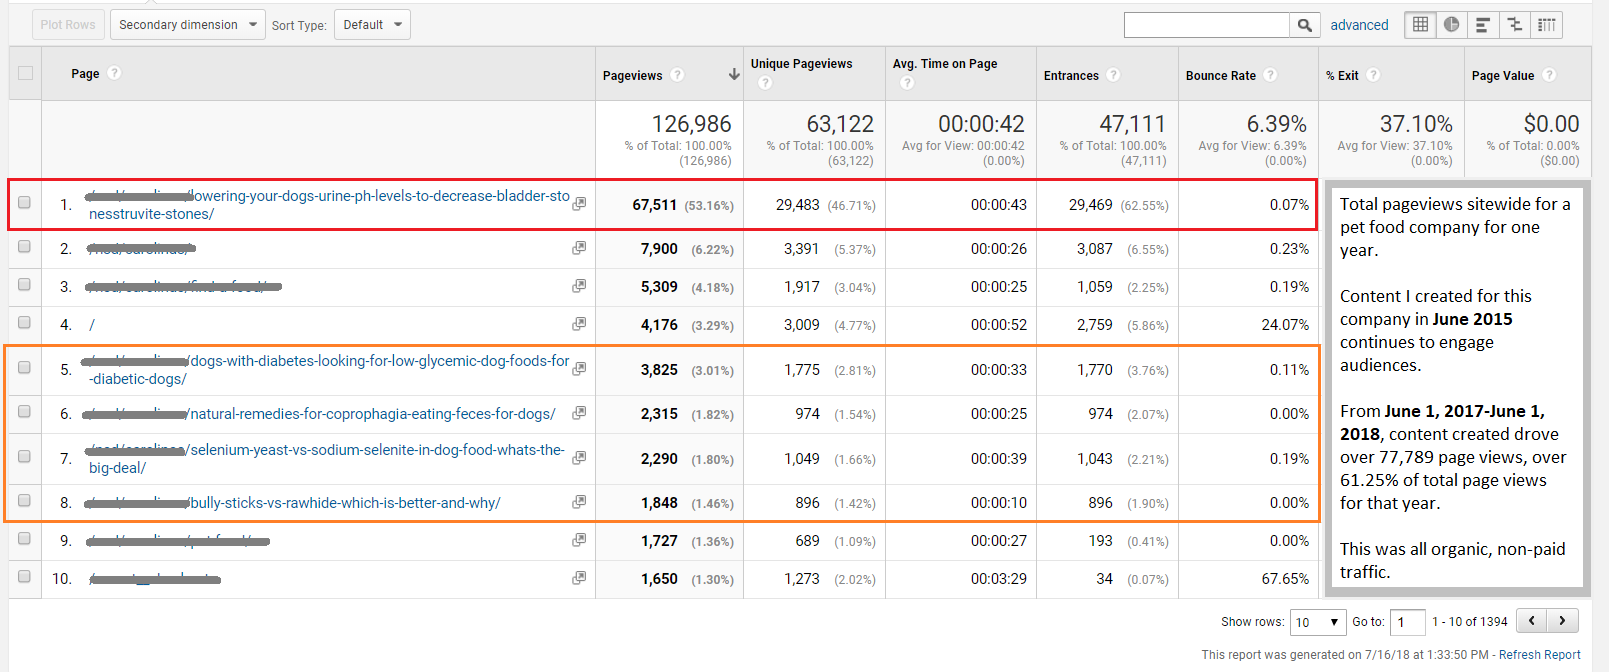 Increased website traffic realtors mission marketing today delicia ivins